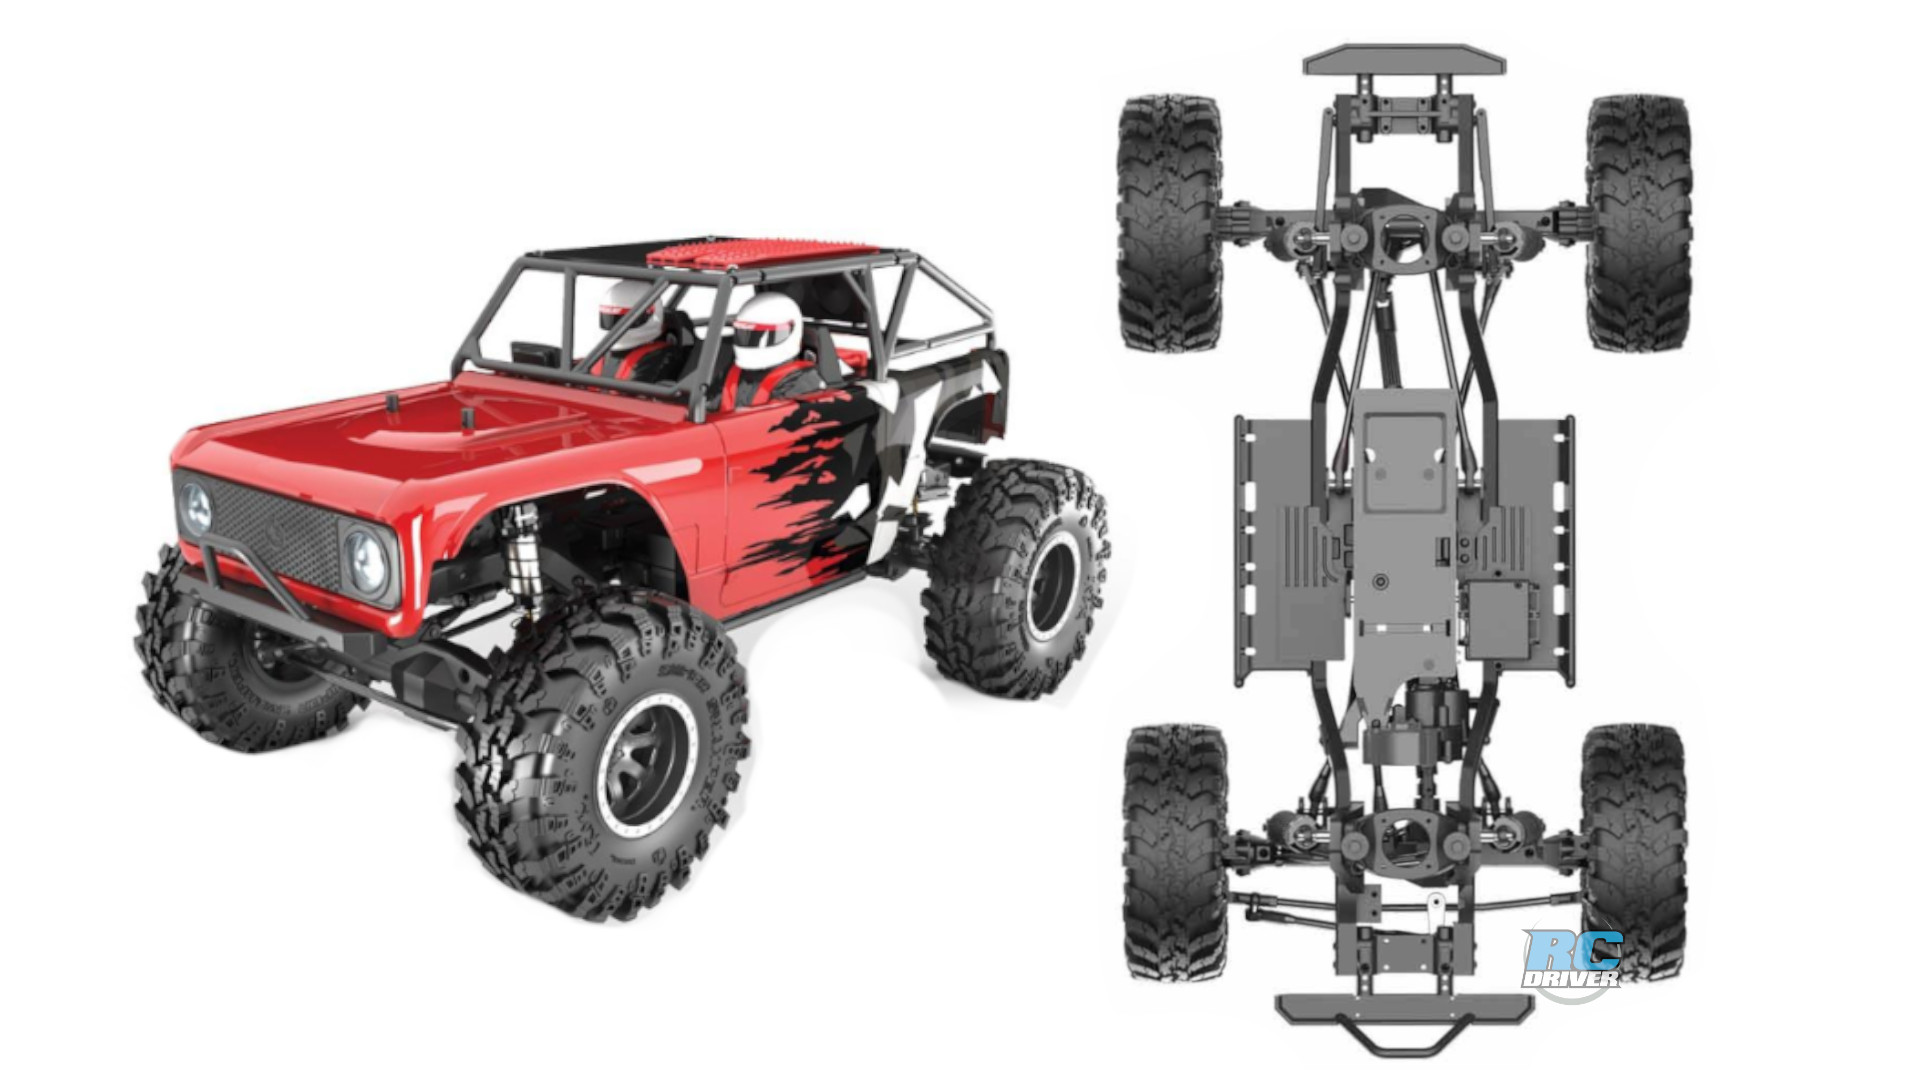 Redcat Wendigo Builder's Kit announced